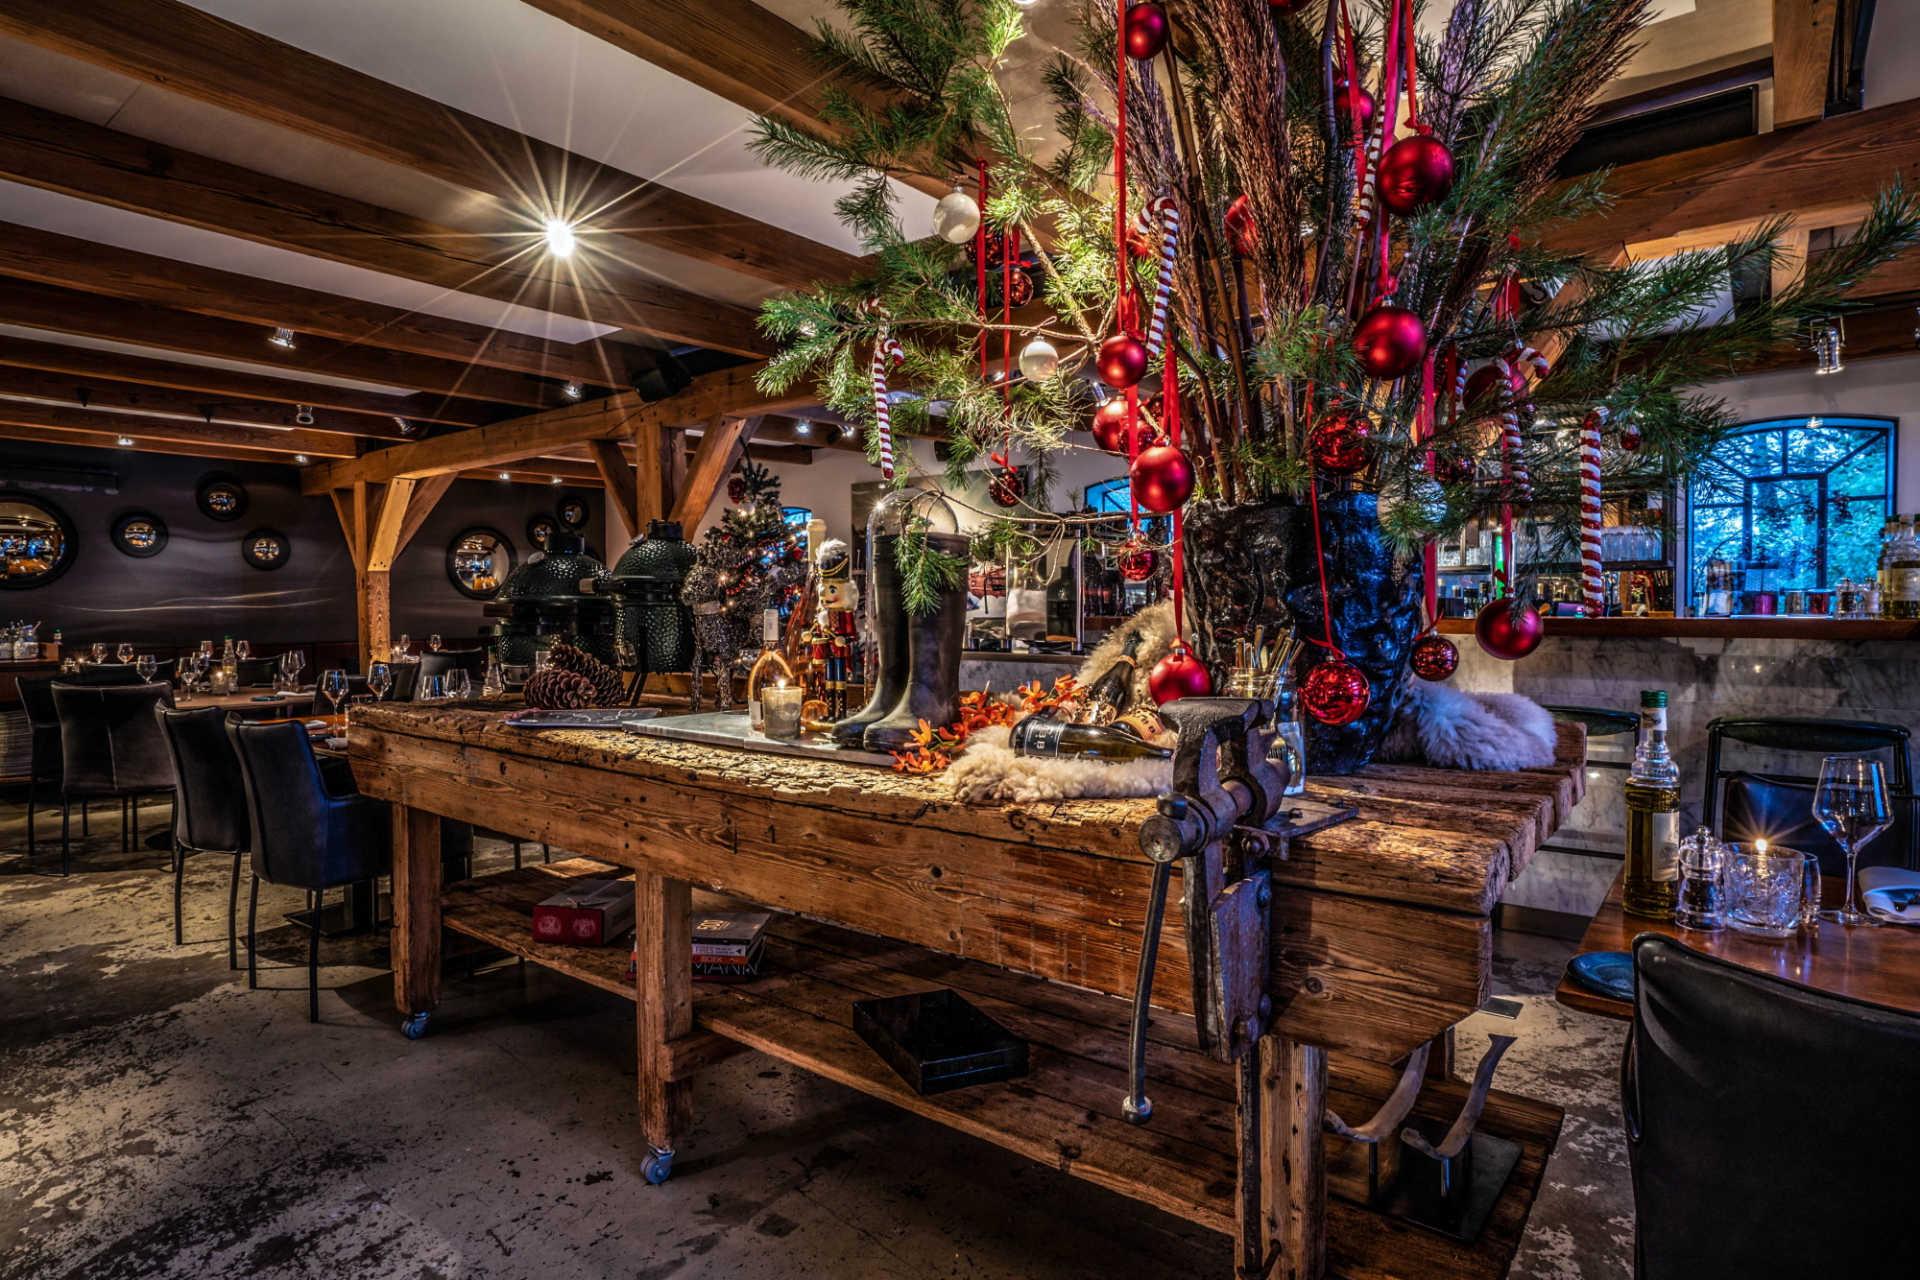 Bavette kerst Maasland